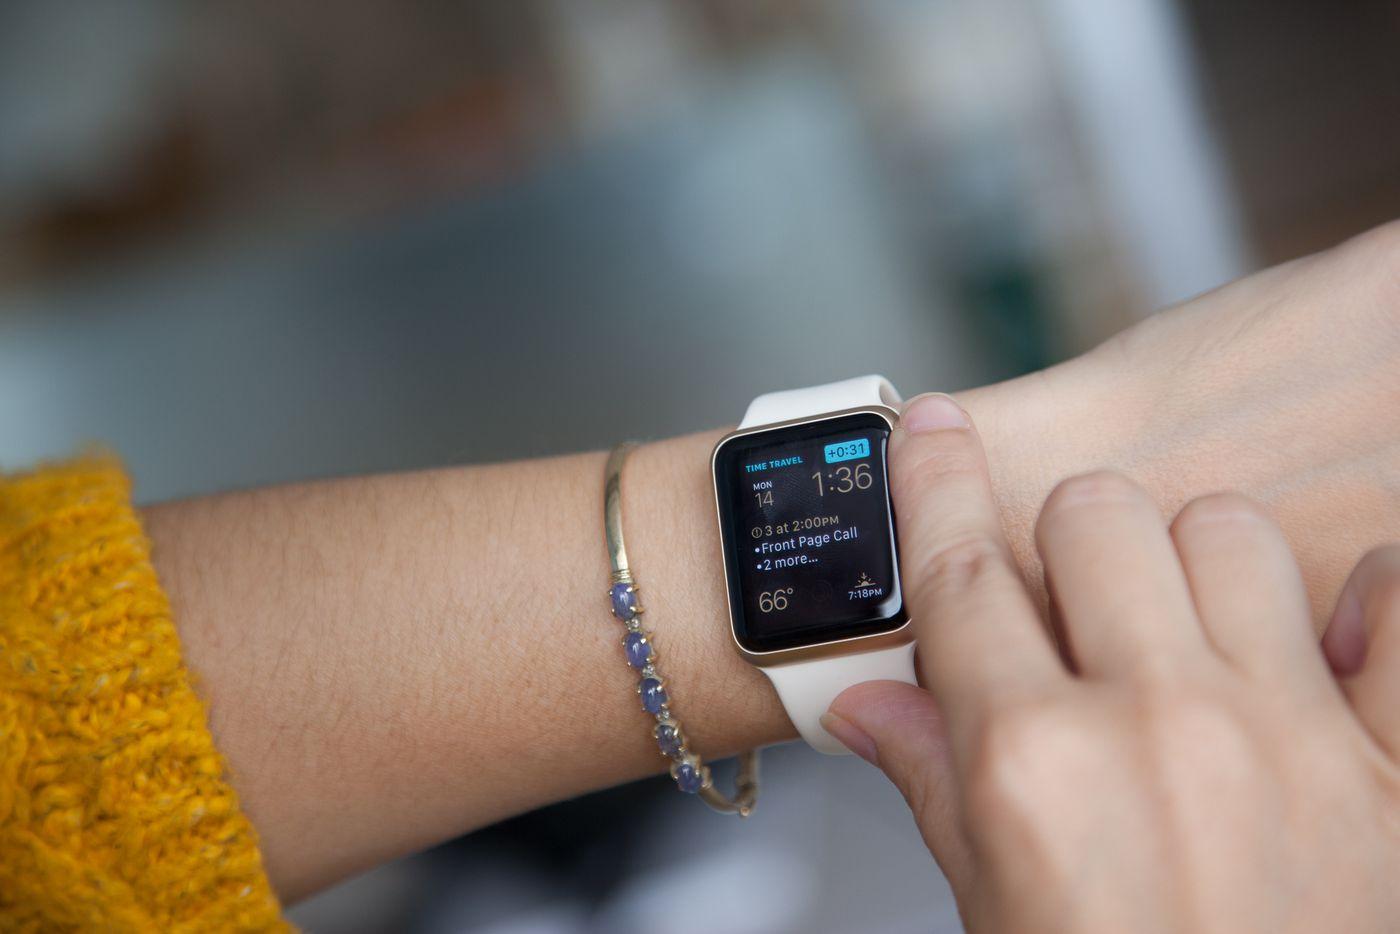 Apple watch 02 sensor